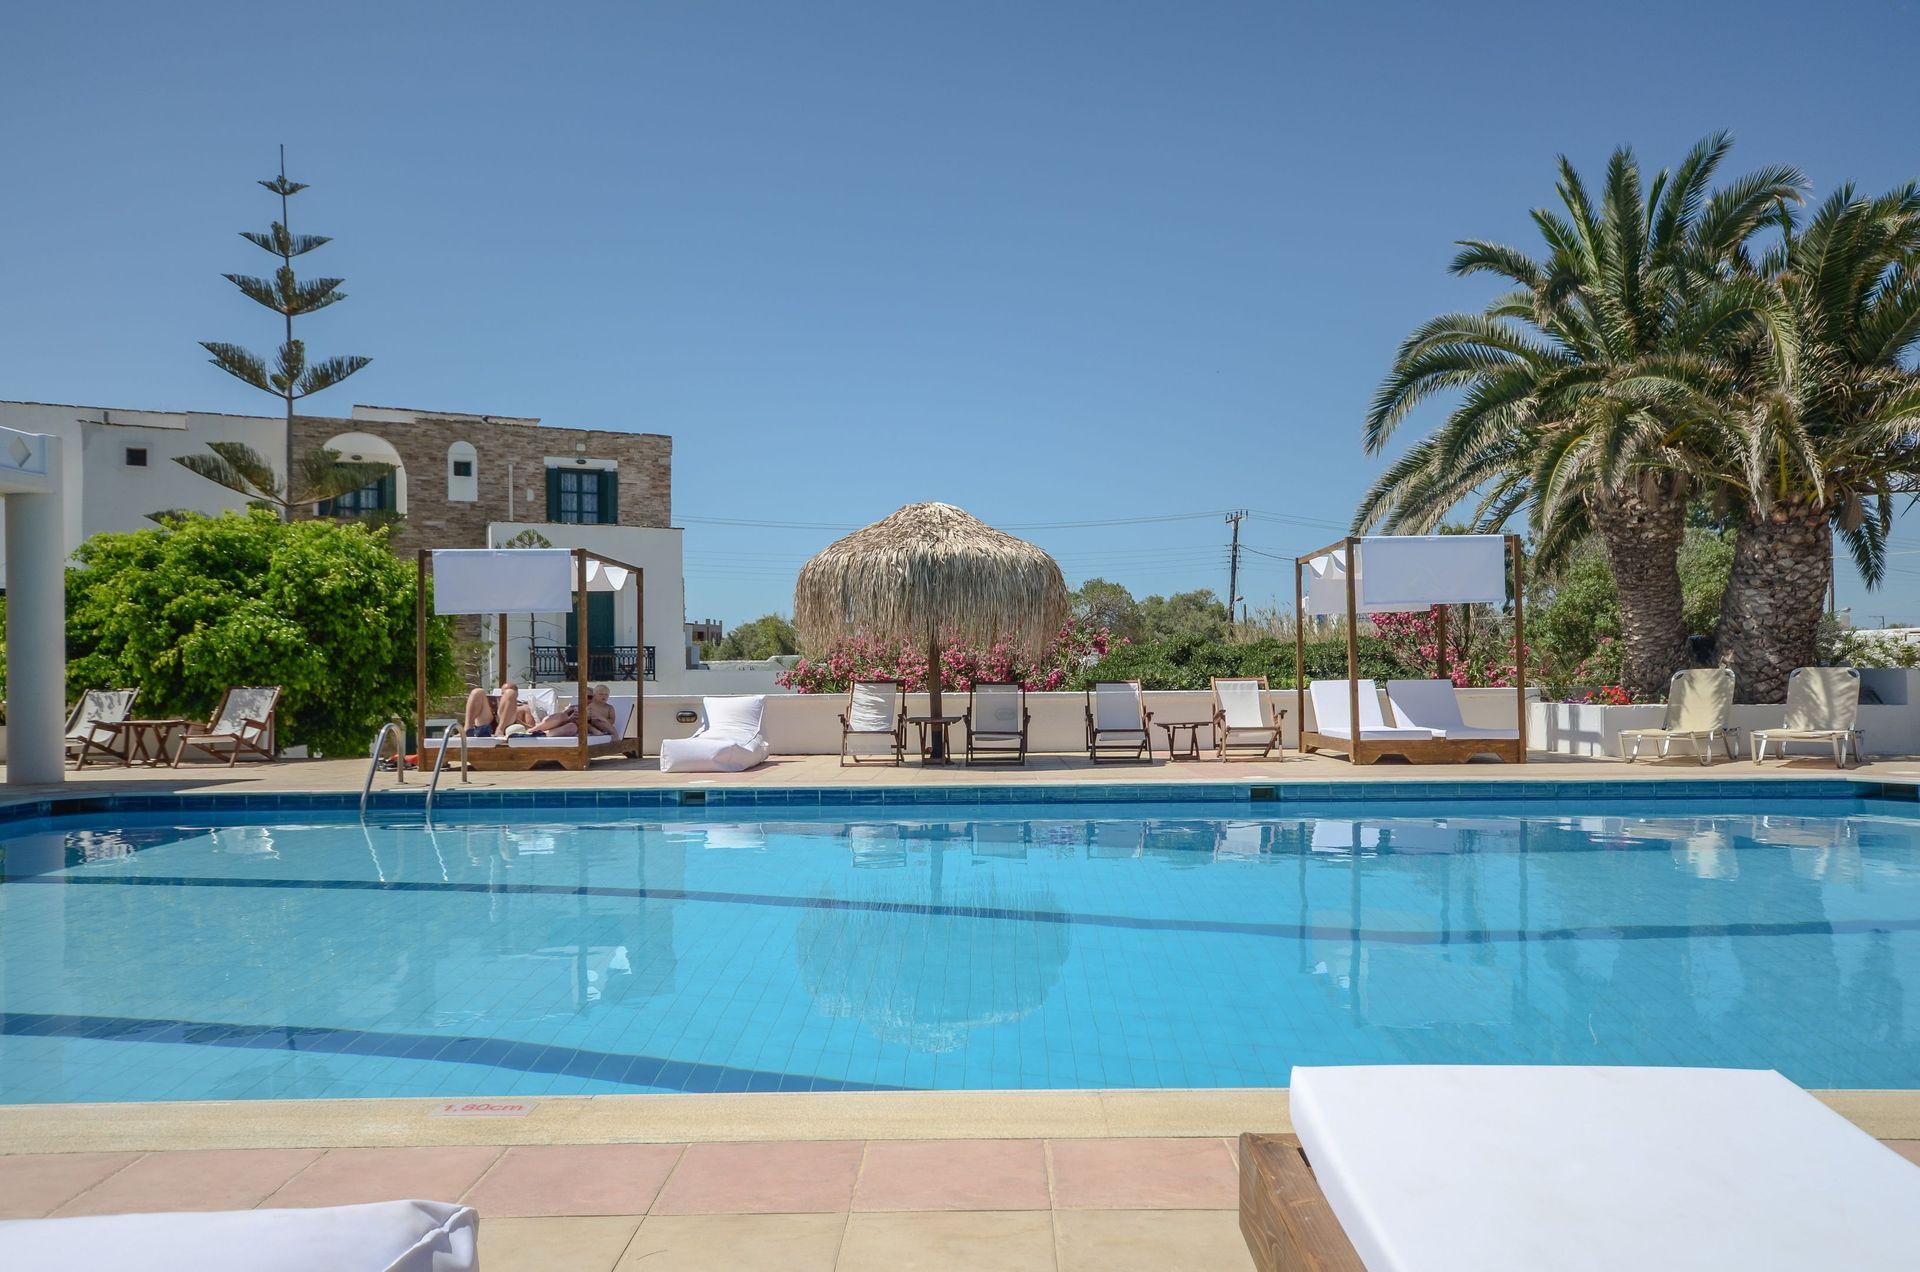 Naxos Beach Hotel - Νάξος ✦ 2 Ημέρες (1 Διανυκτέρευση) ✦ 2 άτομα + 1 παιδί έως 2 ετών ✦ Χωρίς Πρωινό ✦ 01/07/2021 έως 31/08/2021 ✦ Κοντά σε Παραλία!